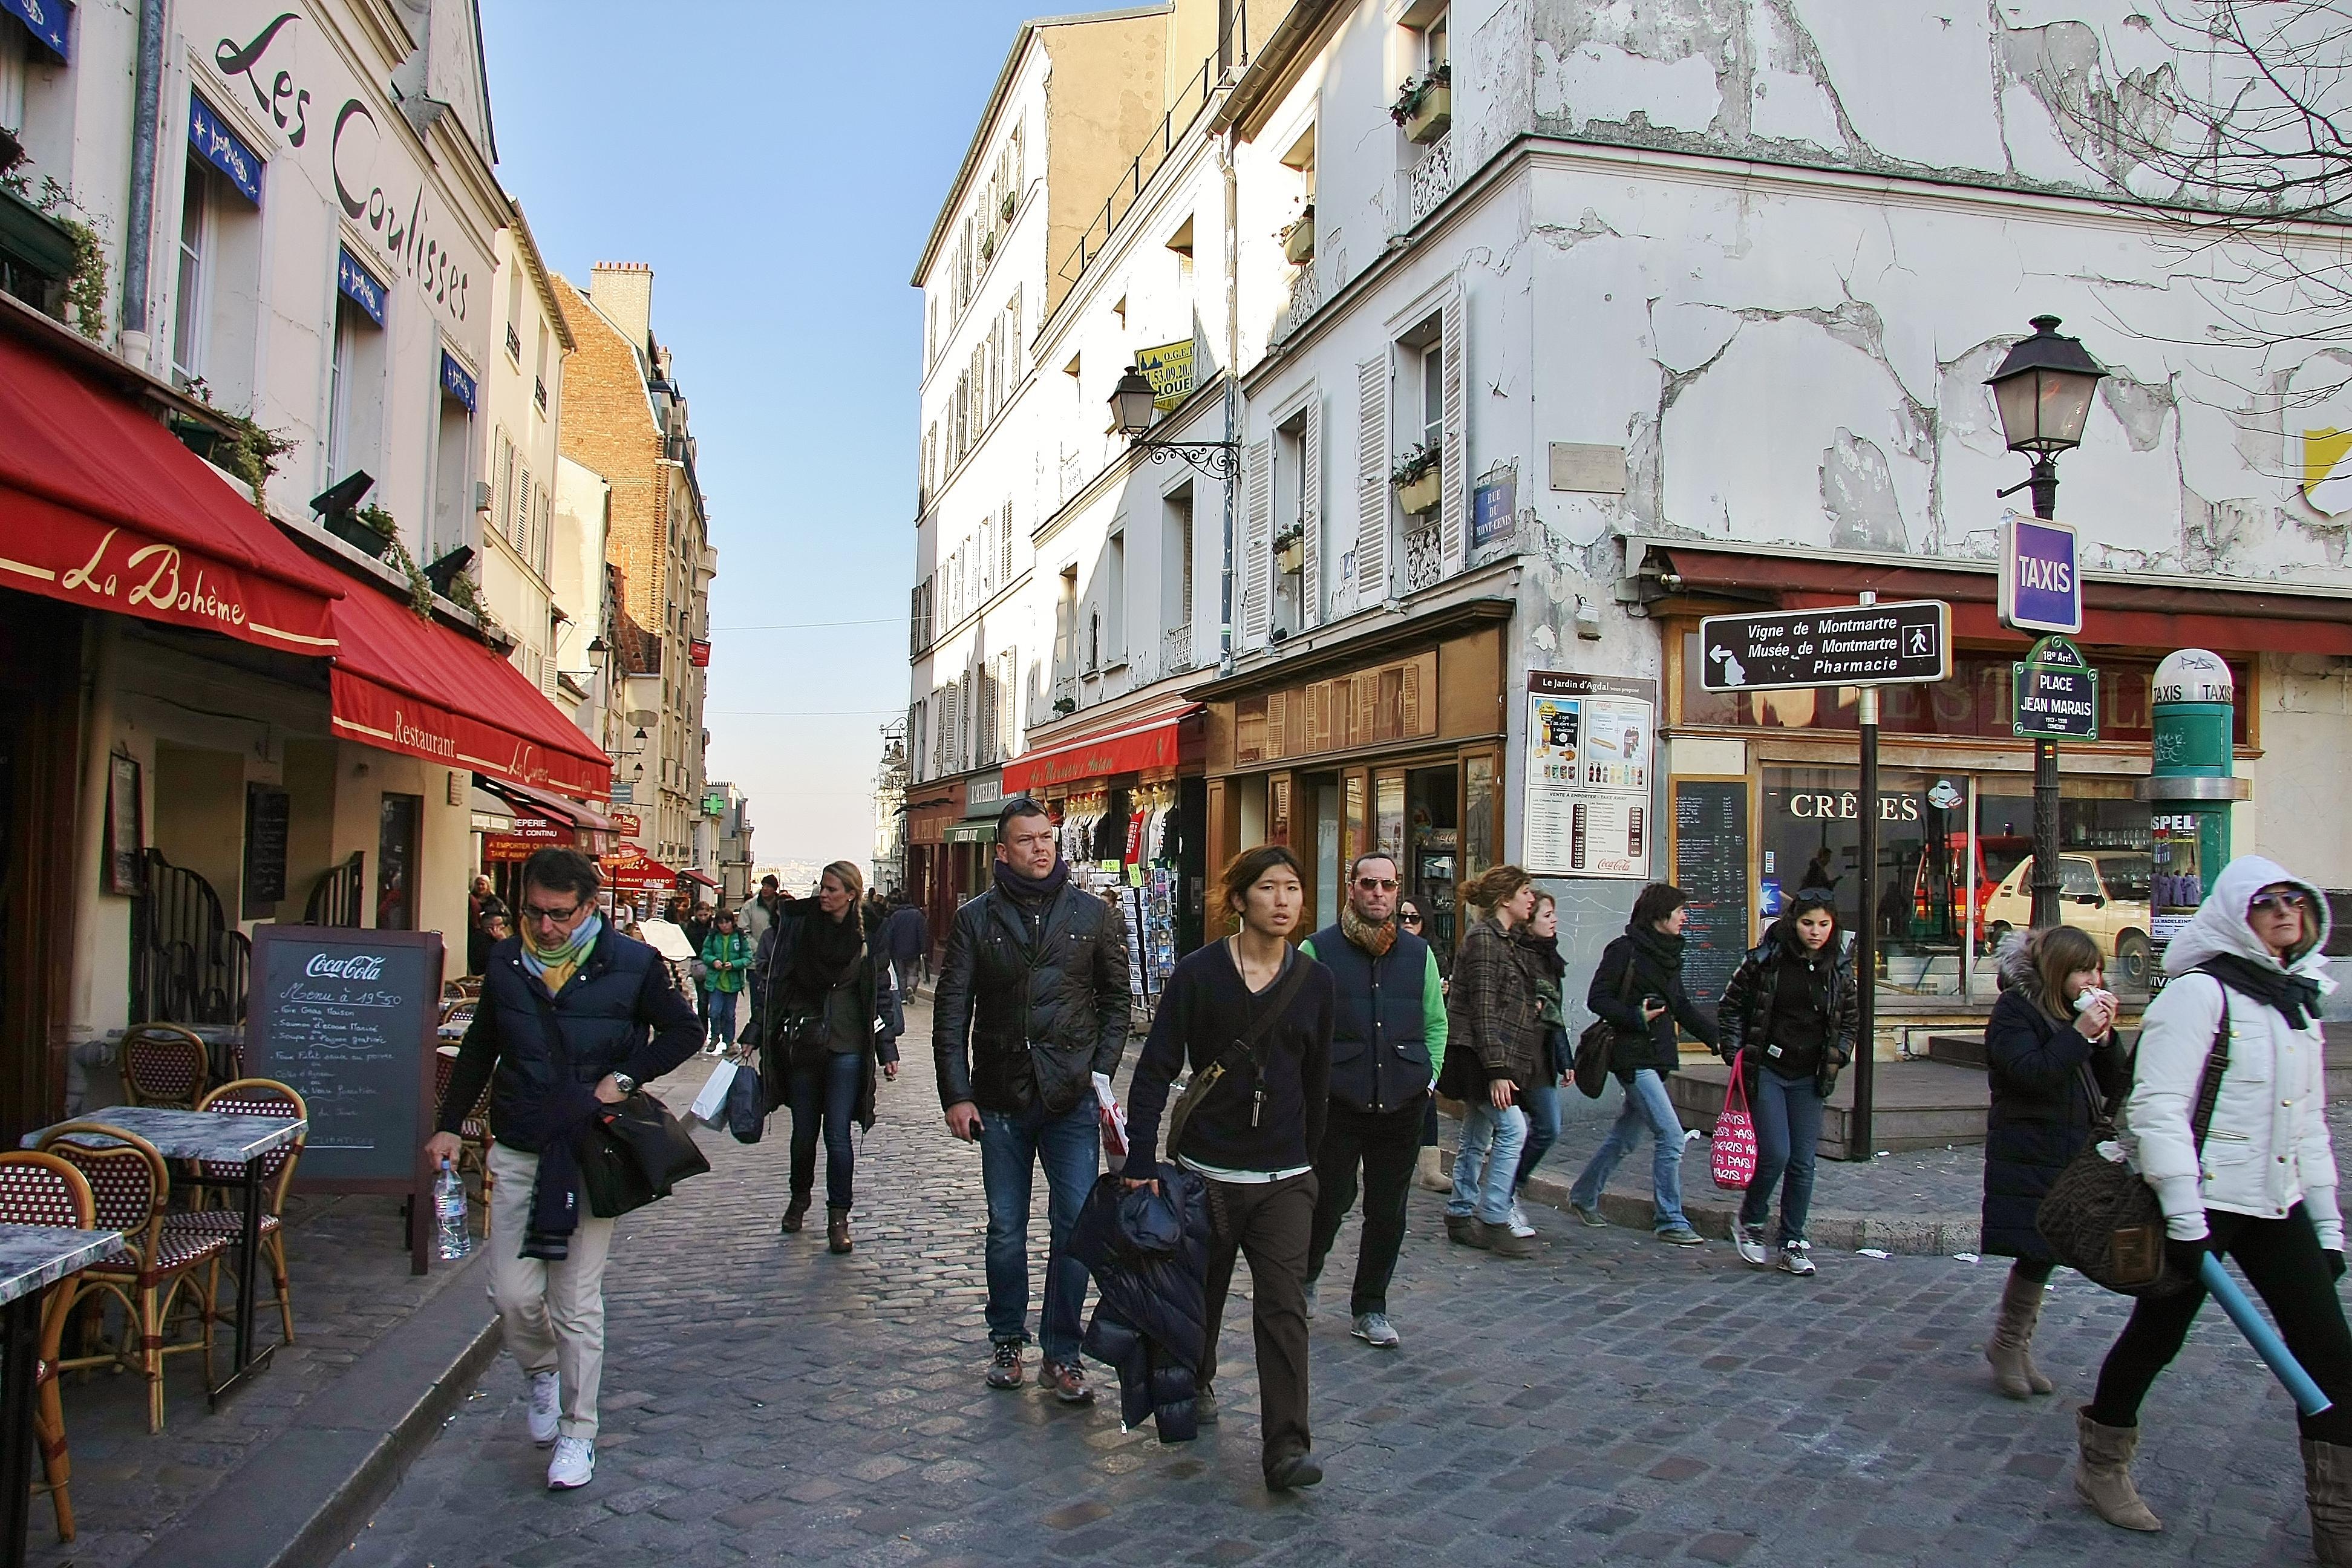 Paris Street Cafe Painting